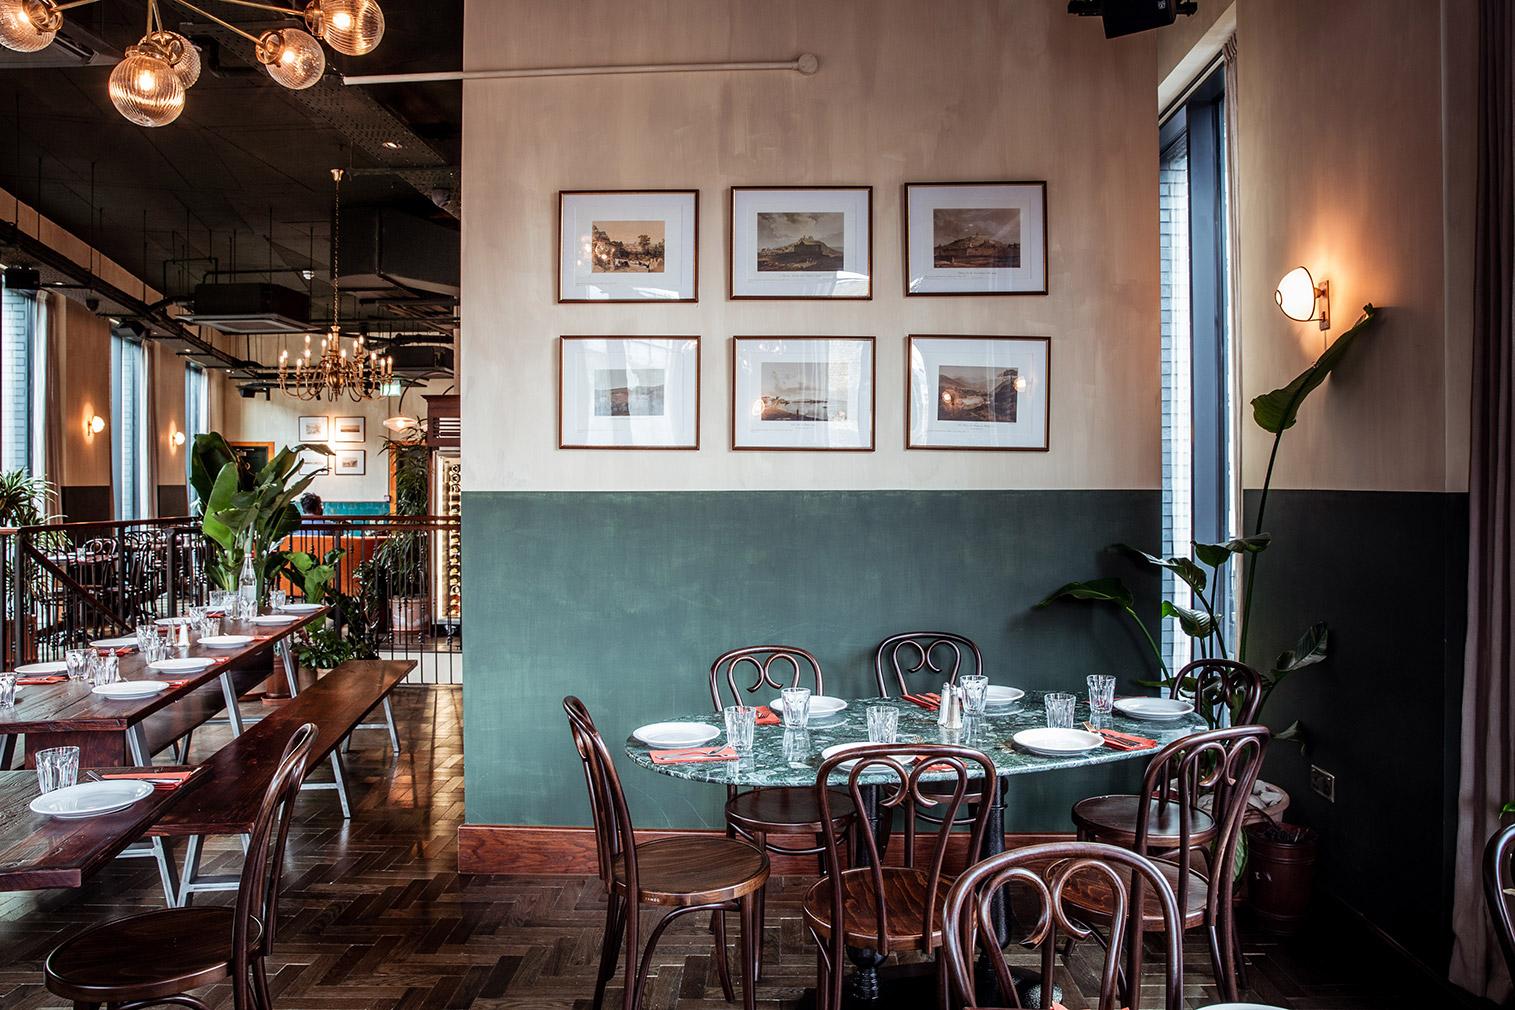 Casa do Frango brings a slice of the Algarve to east London